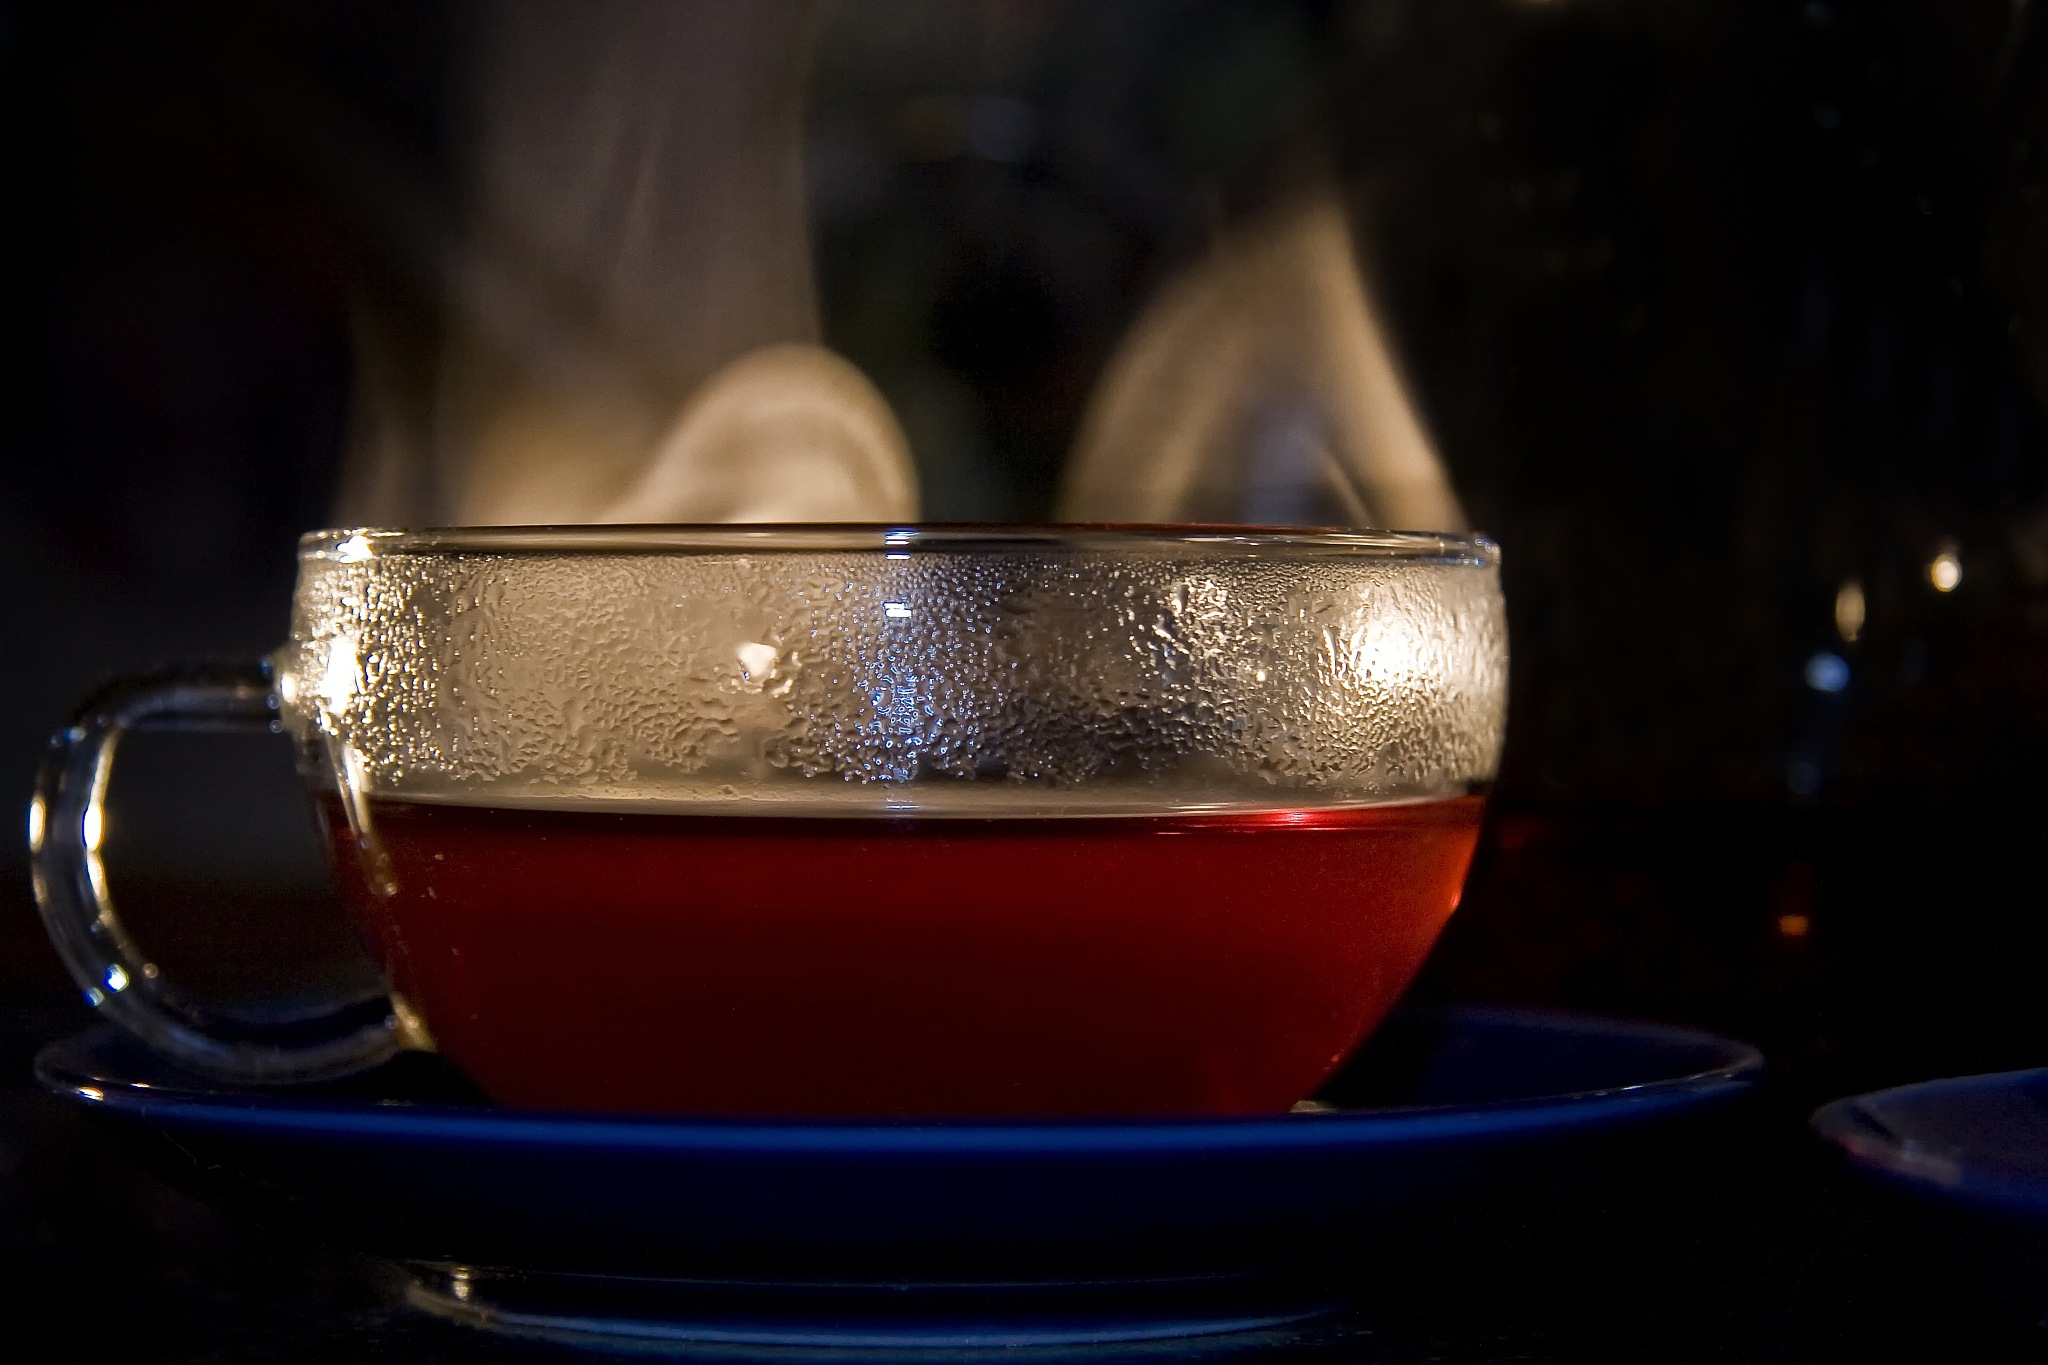 Hot Tea by Michael Feistel